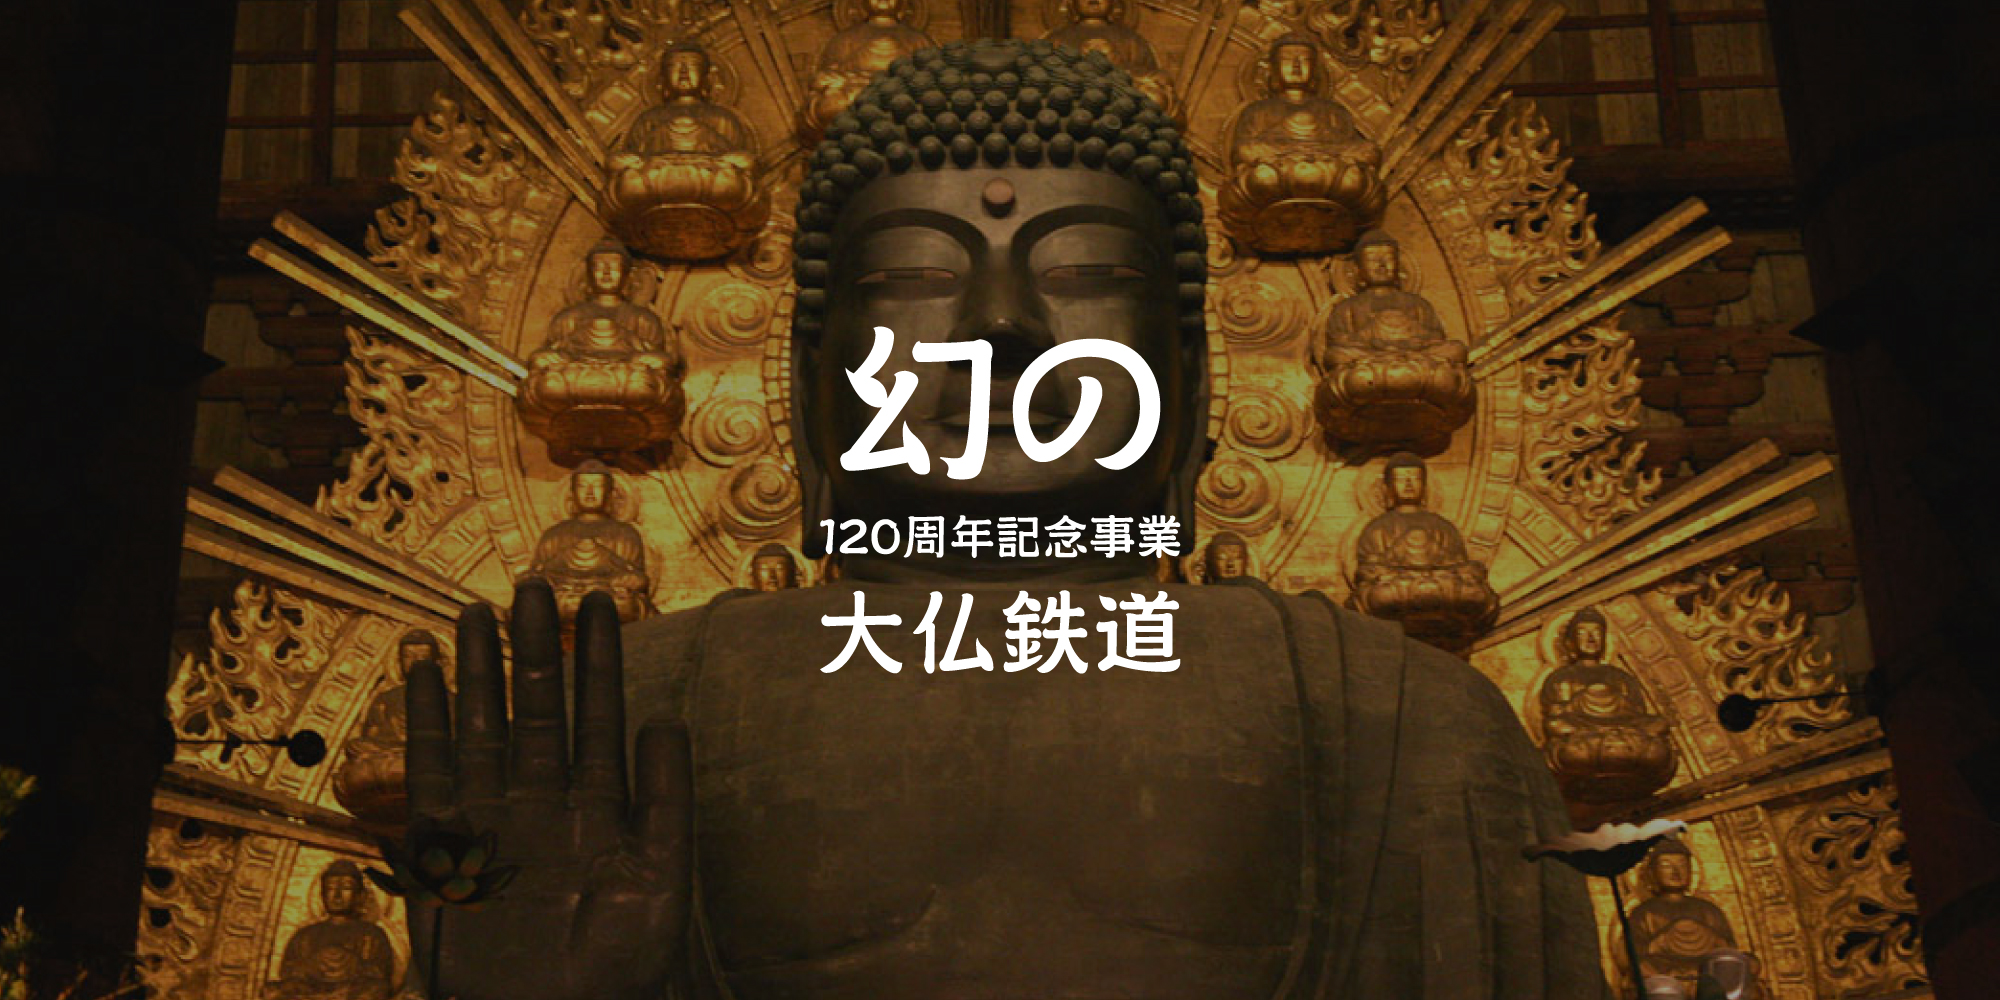 EVENT |幻の大仏鉄道120周年記念事業ワークショップ